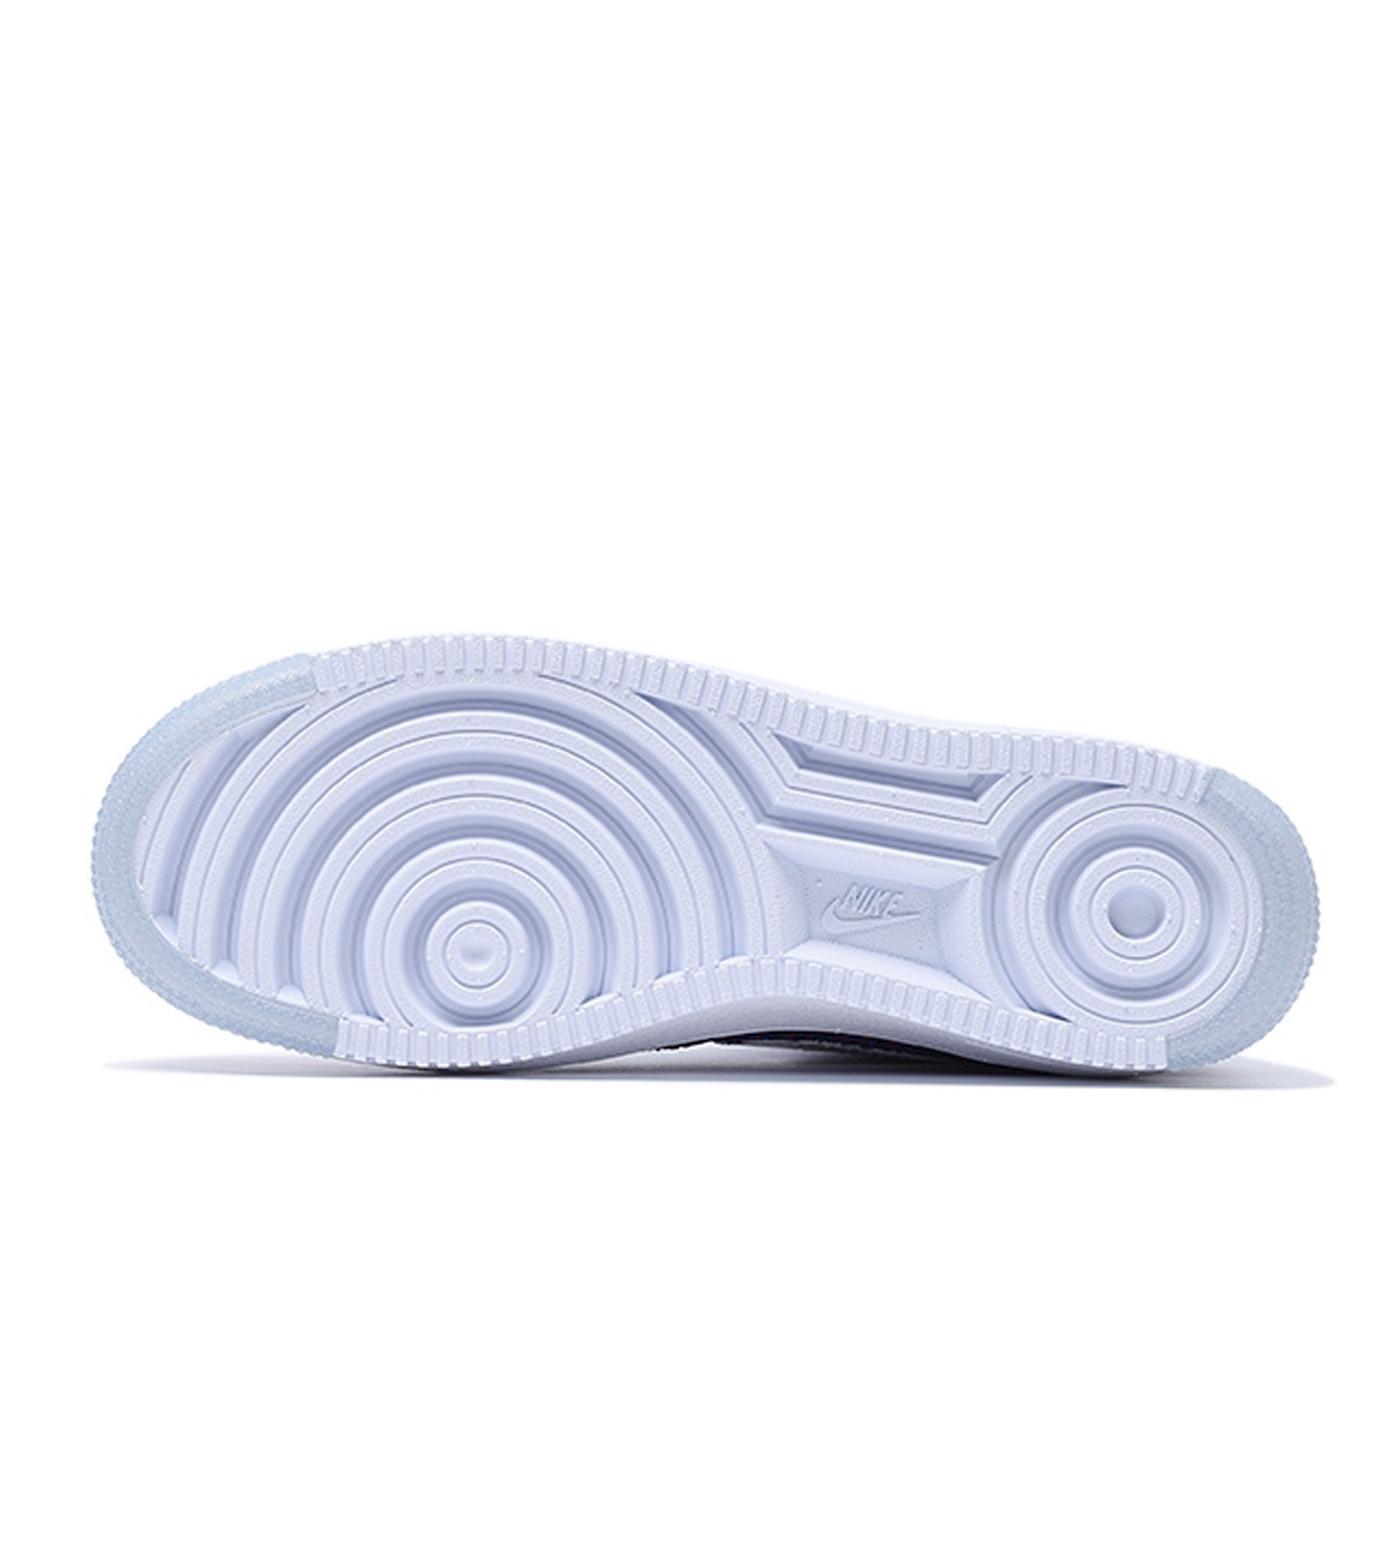 NIKE(ナイキ)のAF1 ULTRA FLYKNIT LOW PRM-BLUE(シューズ/shoes)-826577-601-92 拡大詳細画像2